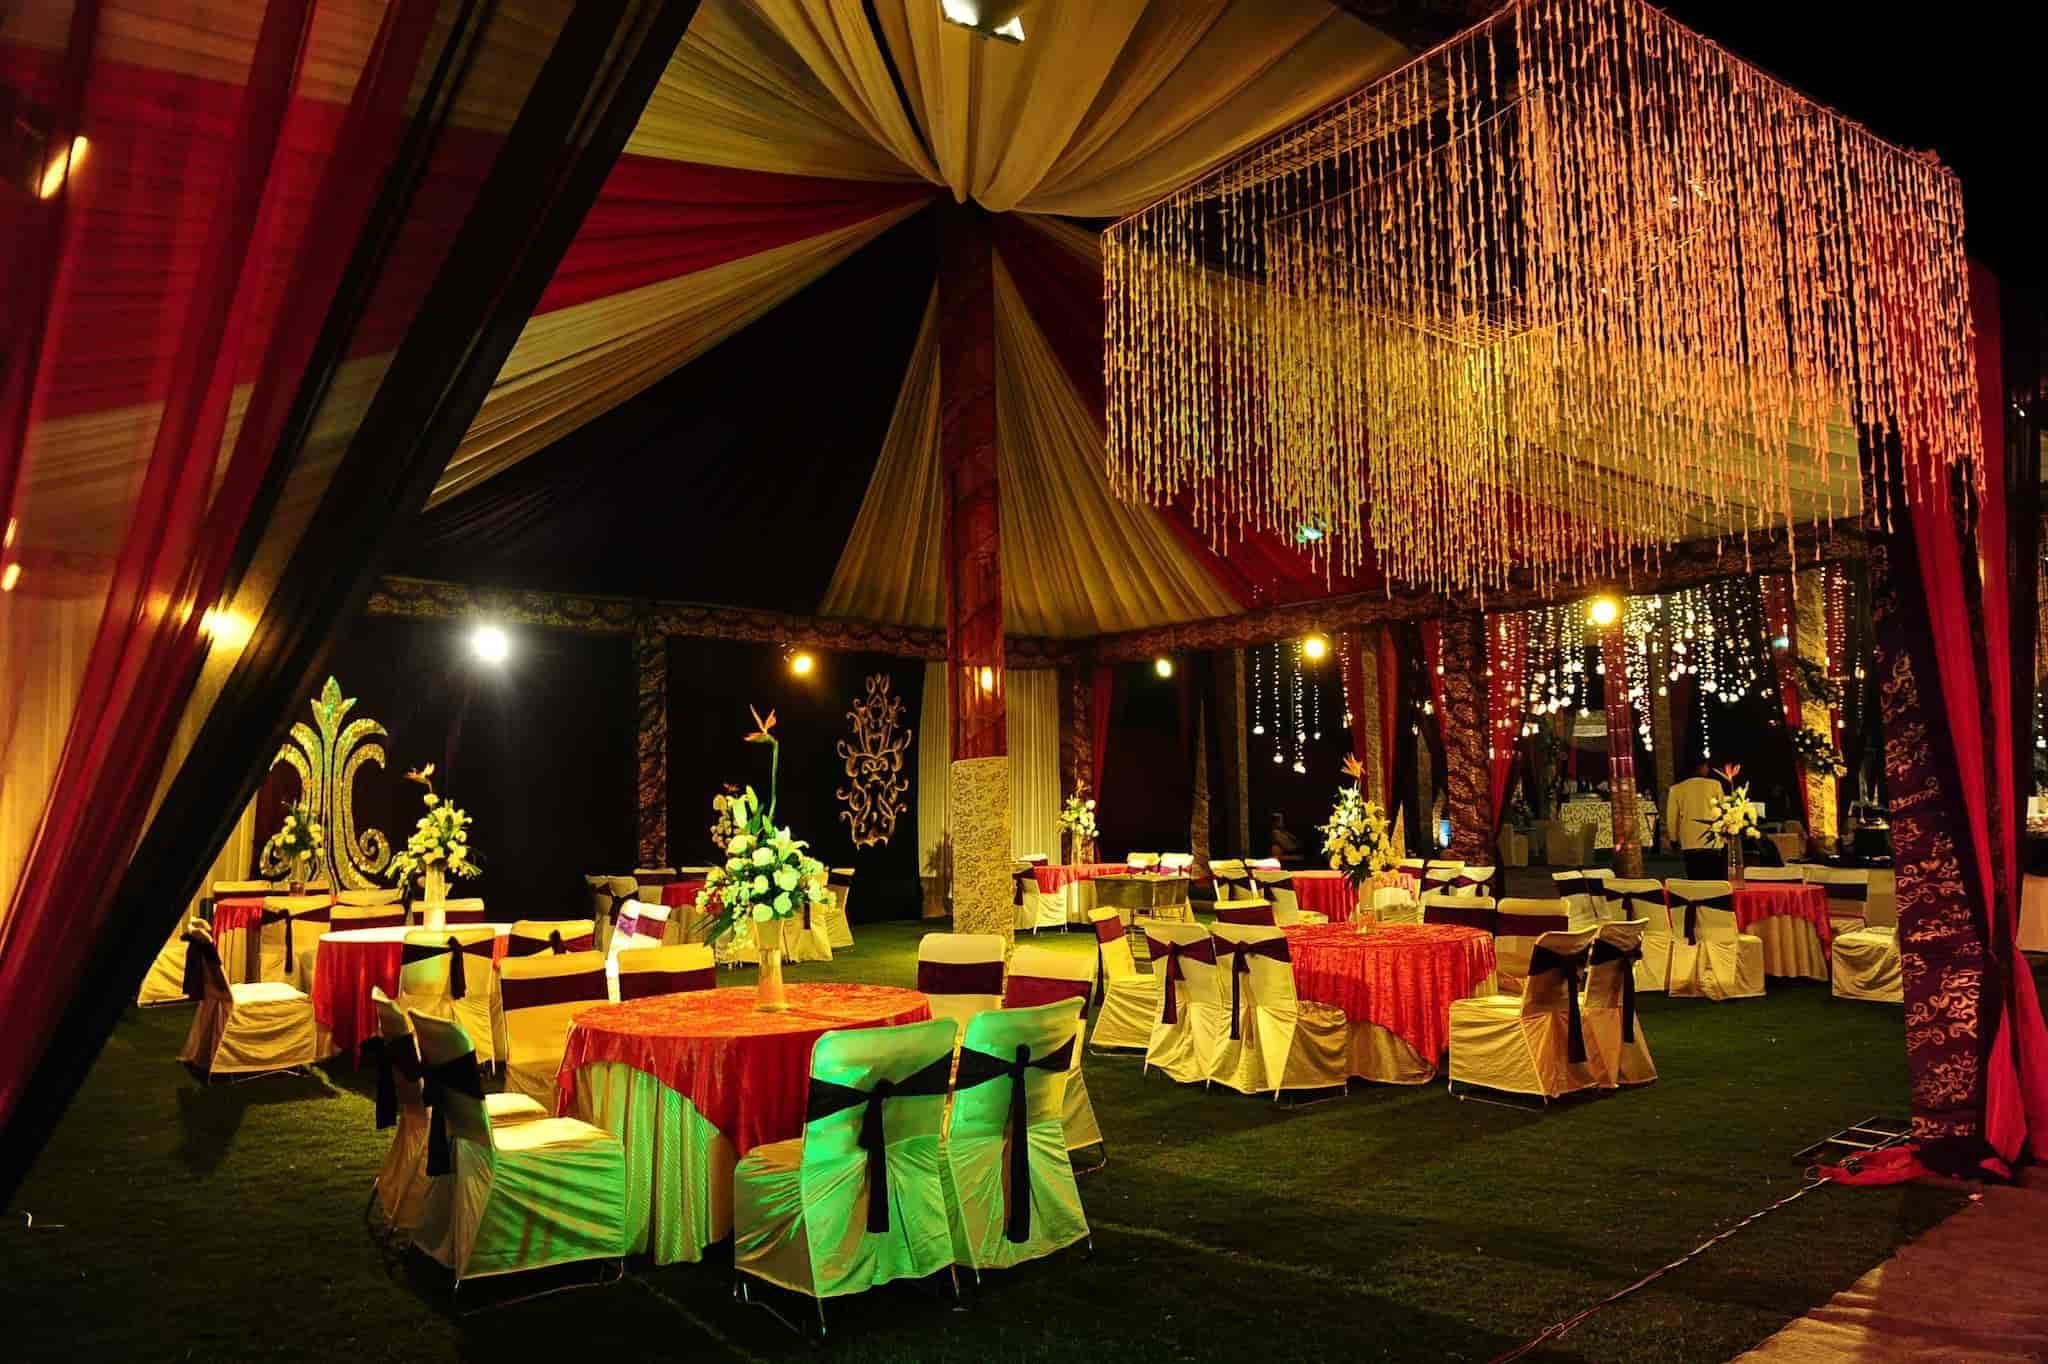 Punjab Tent House Bikaner Best 2017 & Punjab Tent House Mohali - Best Tent 2018